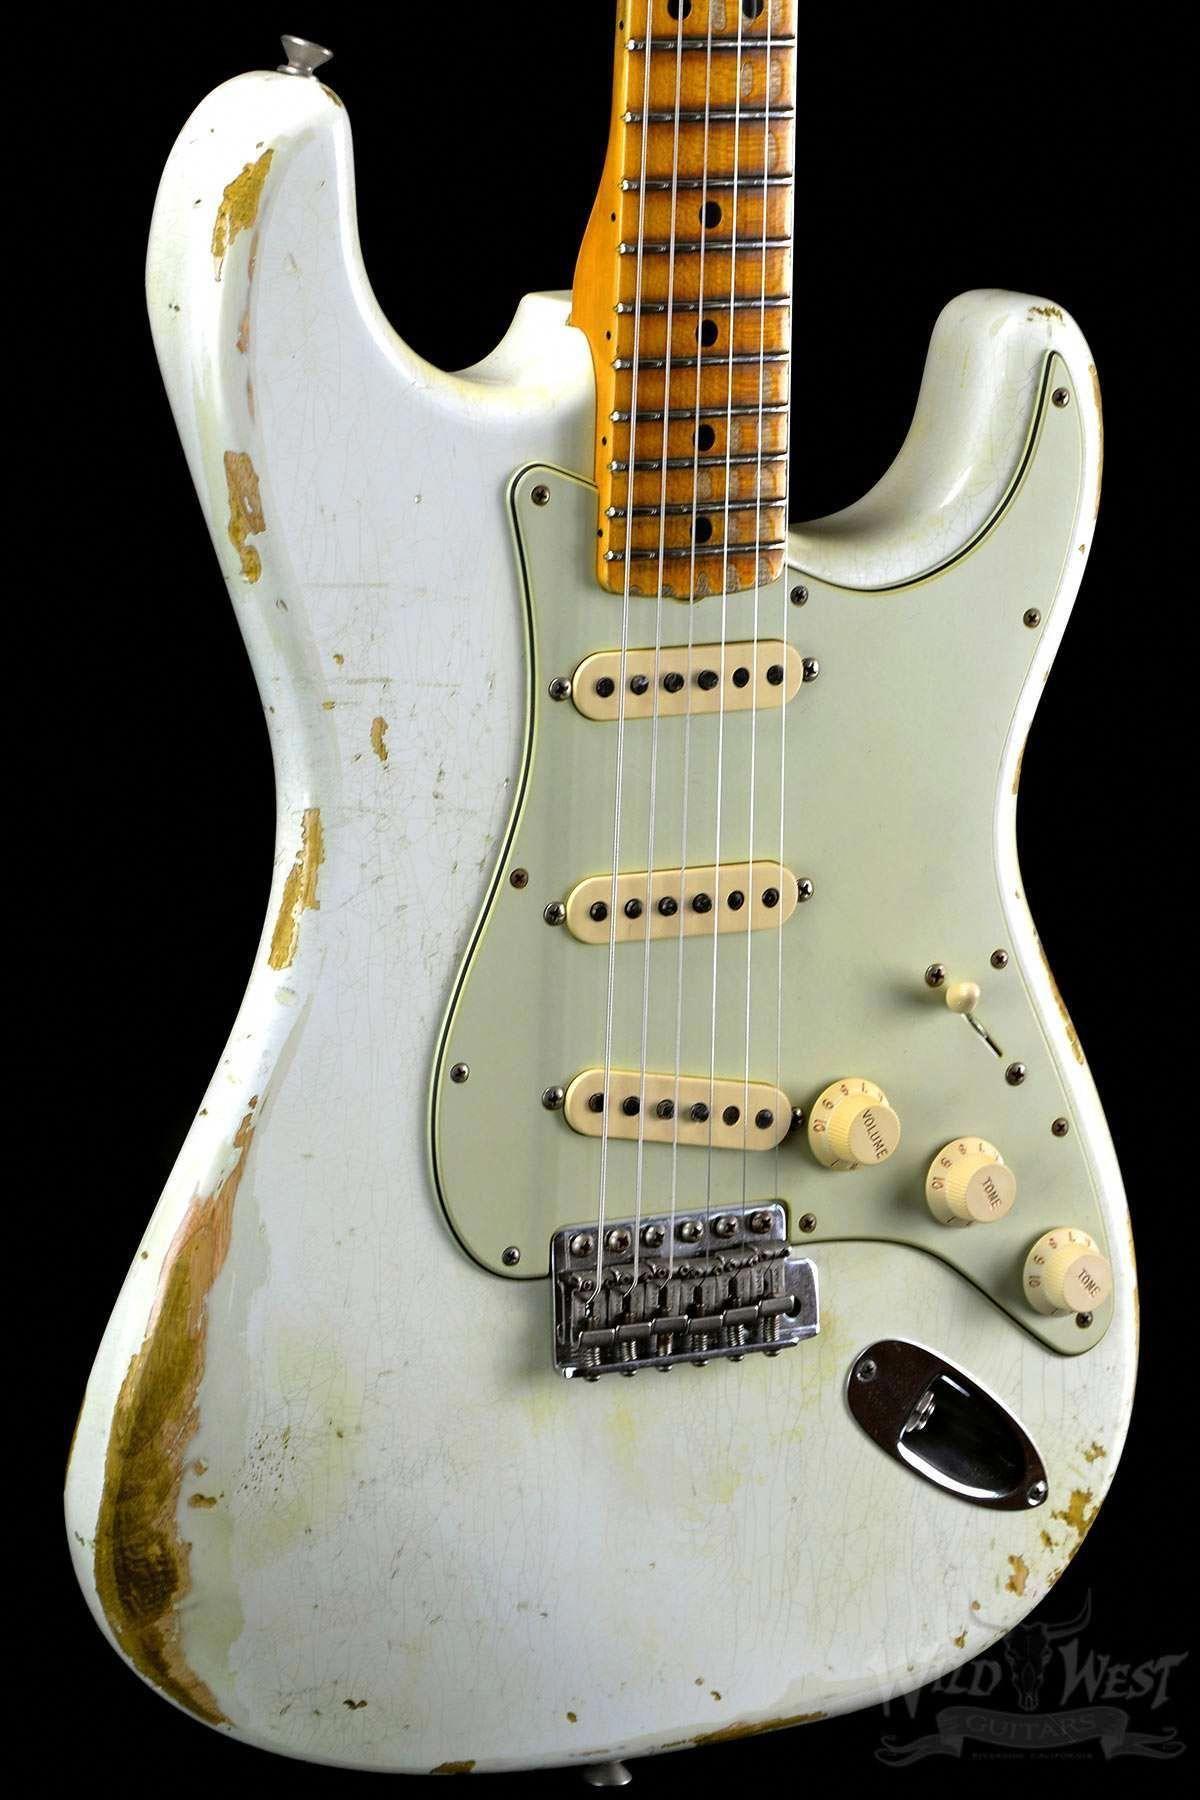 16 Fantastic Fender Guitar History Book Fender Guitar Gemini Ii Guitarshop Guitarlover Fenderg Fender Guitars Fender Guitar Amps Fender Stratocaster Vintage